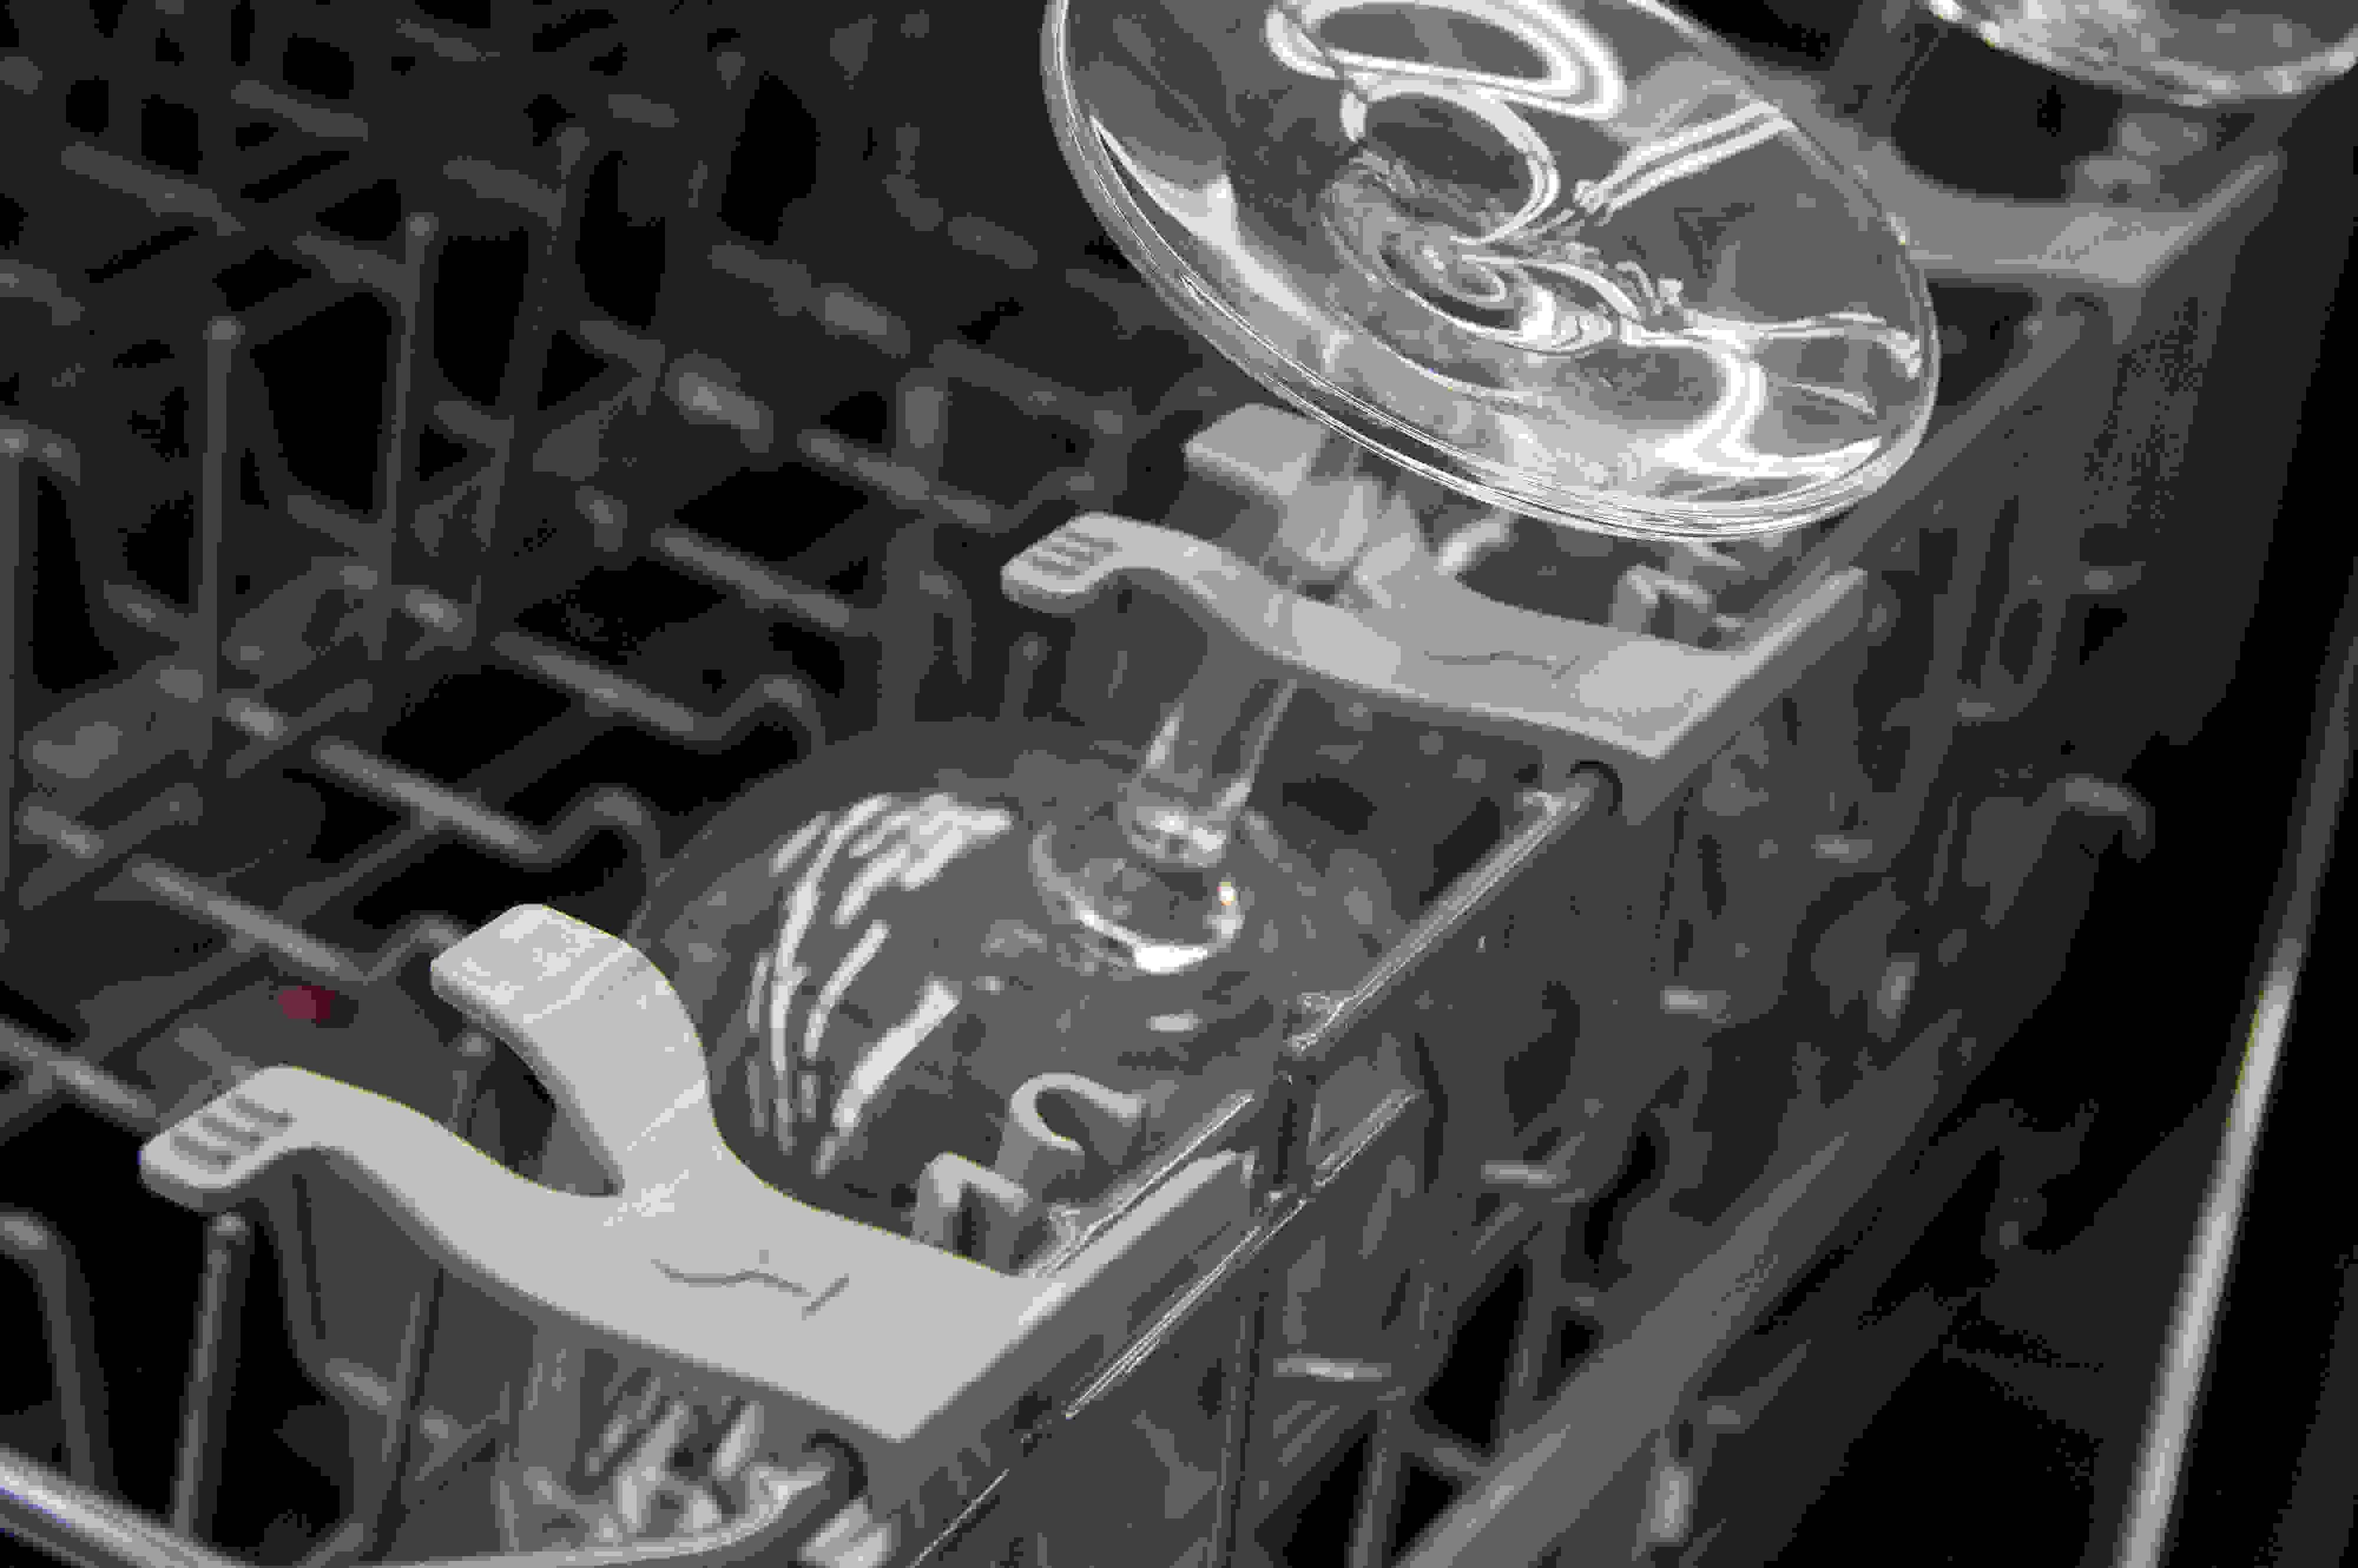 Wine glasses held by the stemware holders